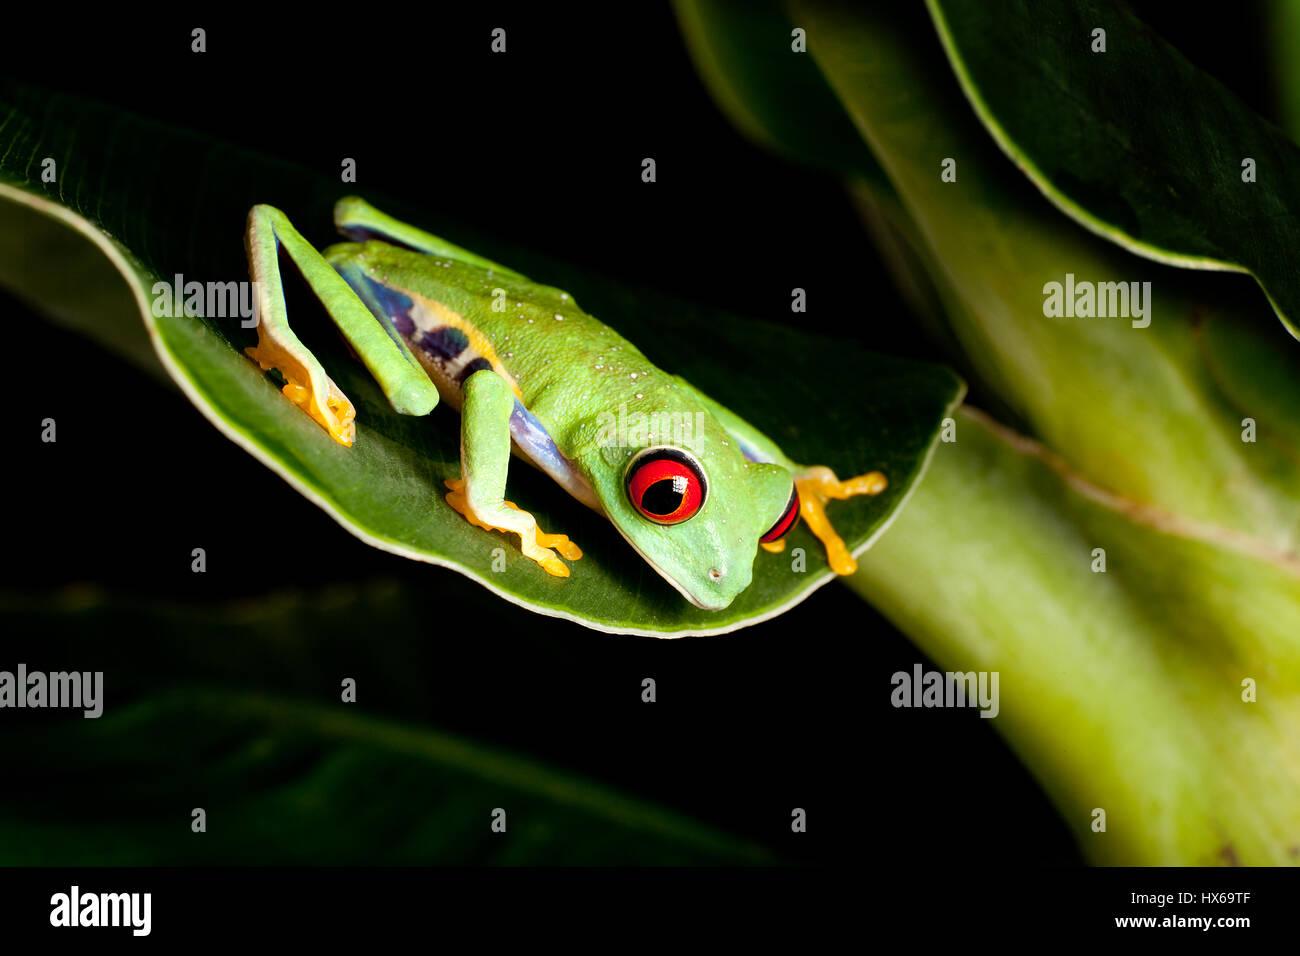 Red eyed tree frog sur feuille de bananier Banque D'Images